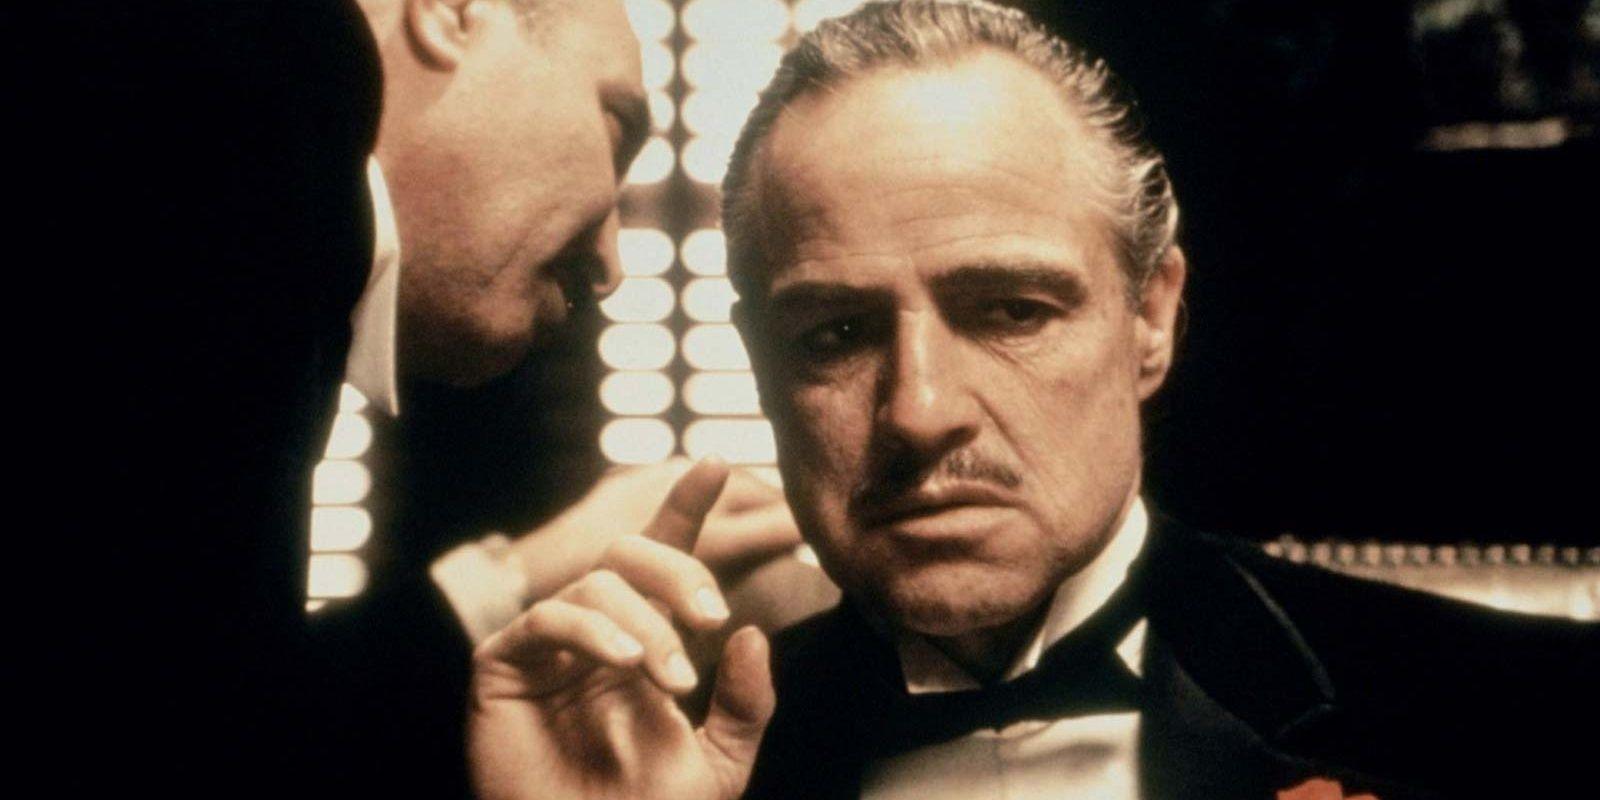 Why Marlon Brando Refused His Oscar For The Godfather